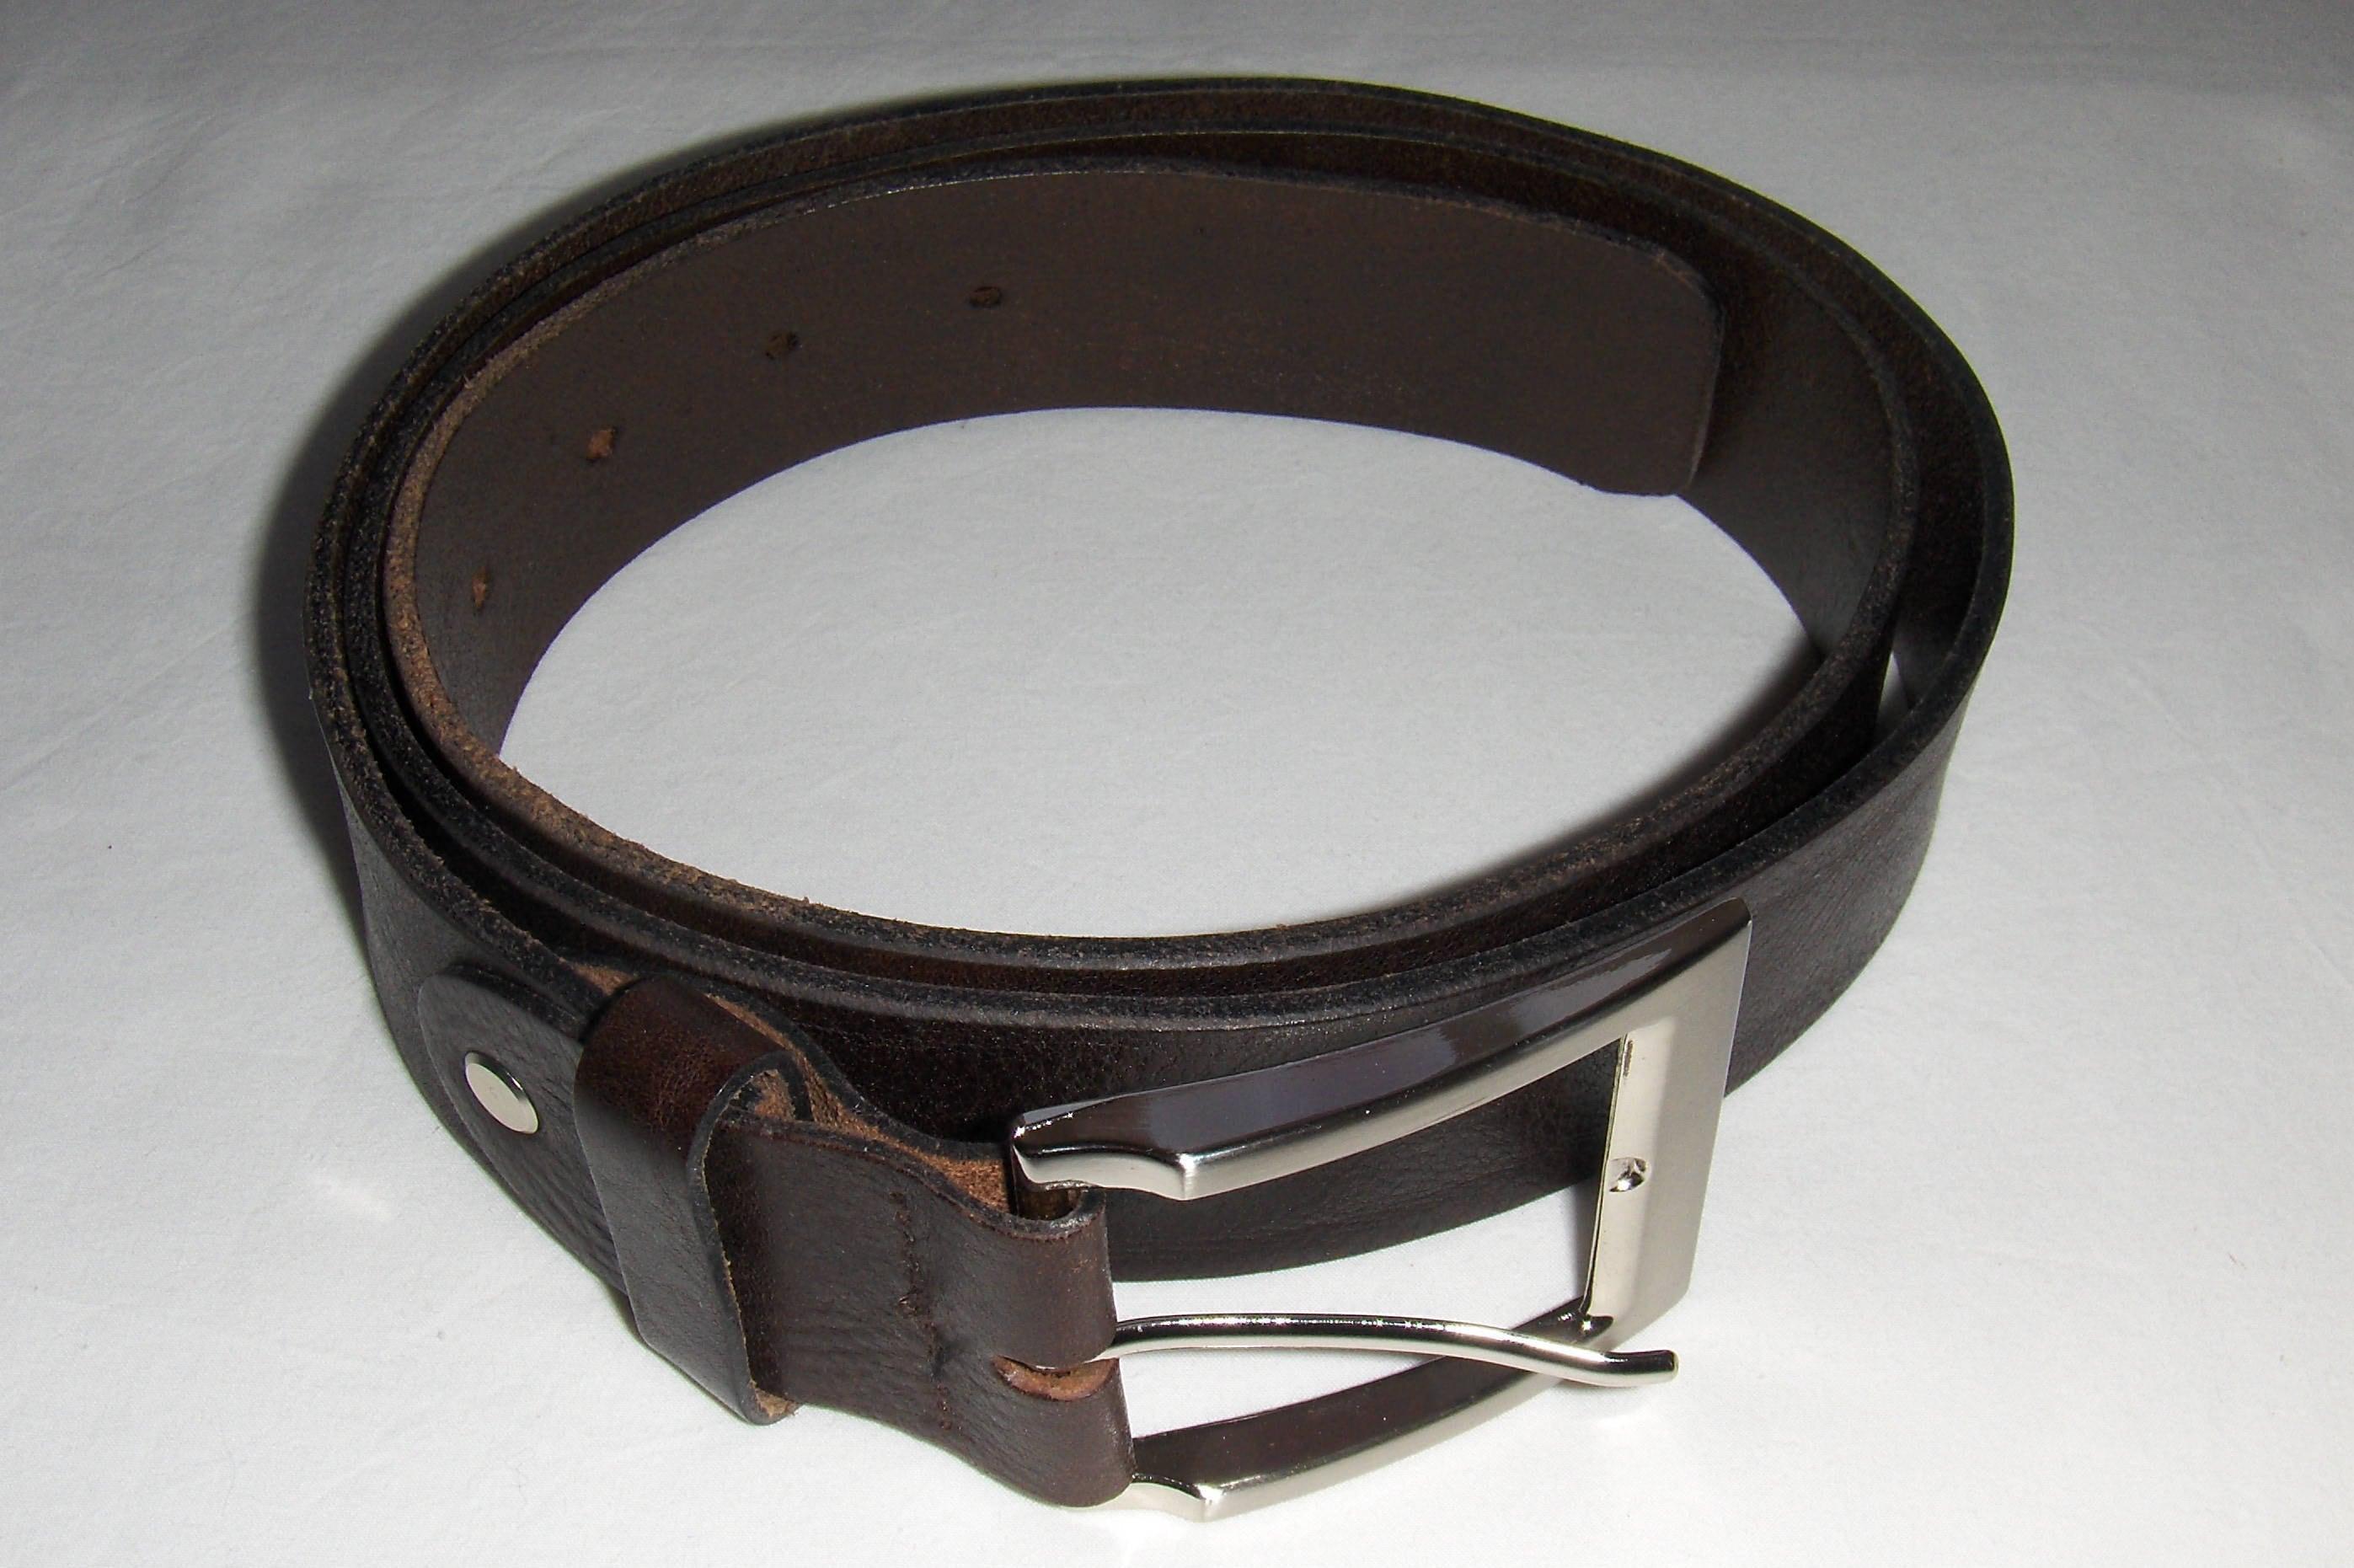 264cf594157fa TOPECO Männer dunkelbraunes Leder Vintage Gürtel mit